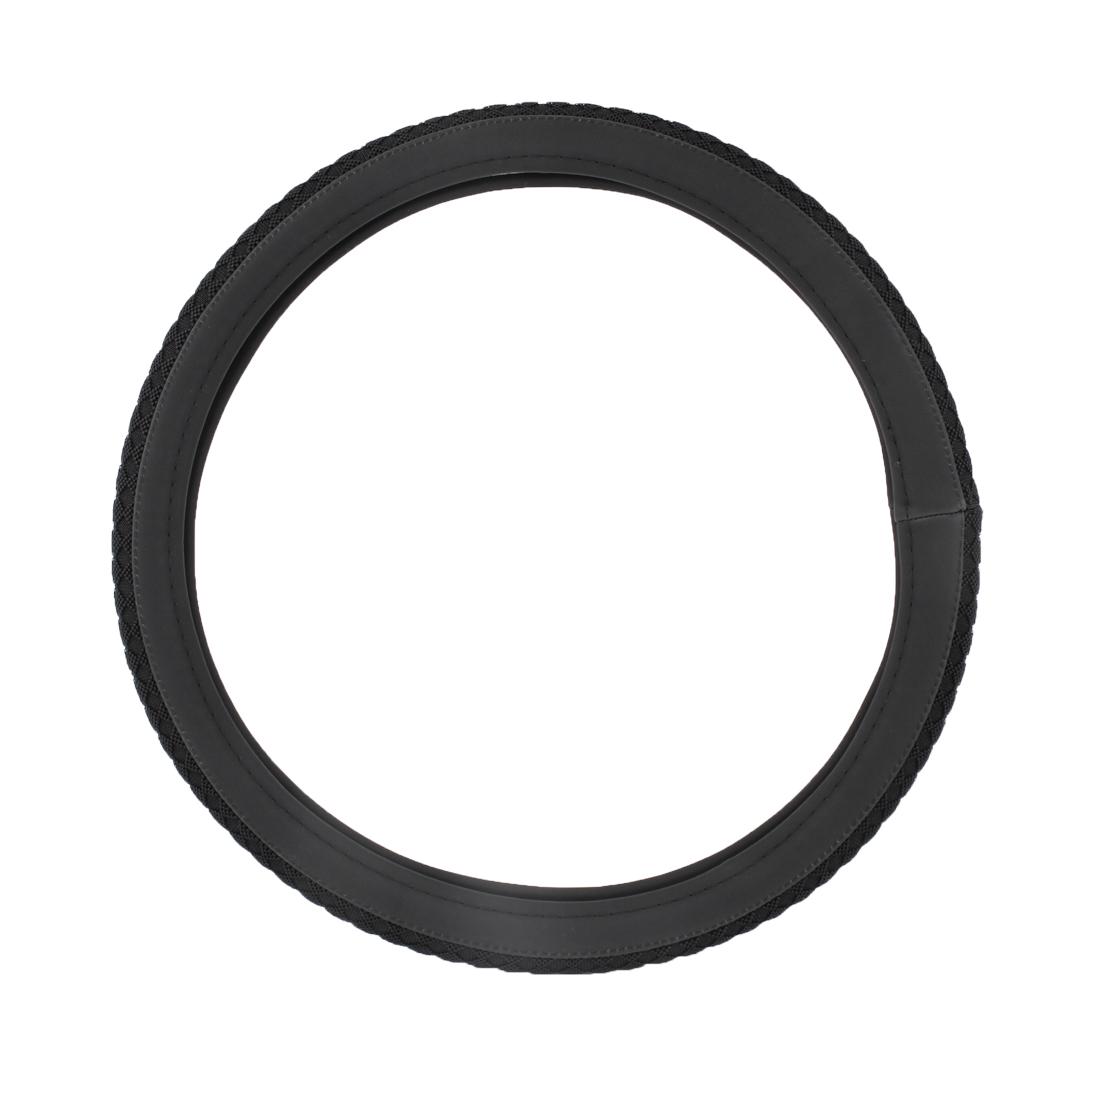 "Black Braid Rhombus Print Power Steering Wheel Cover Wrap 15"" Dia for Car"